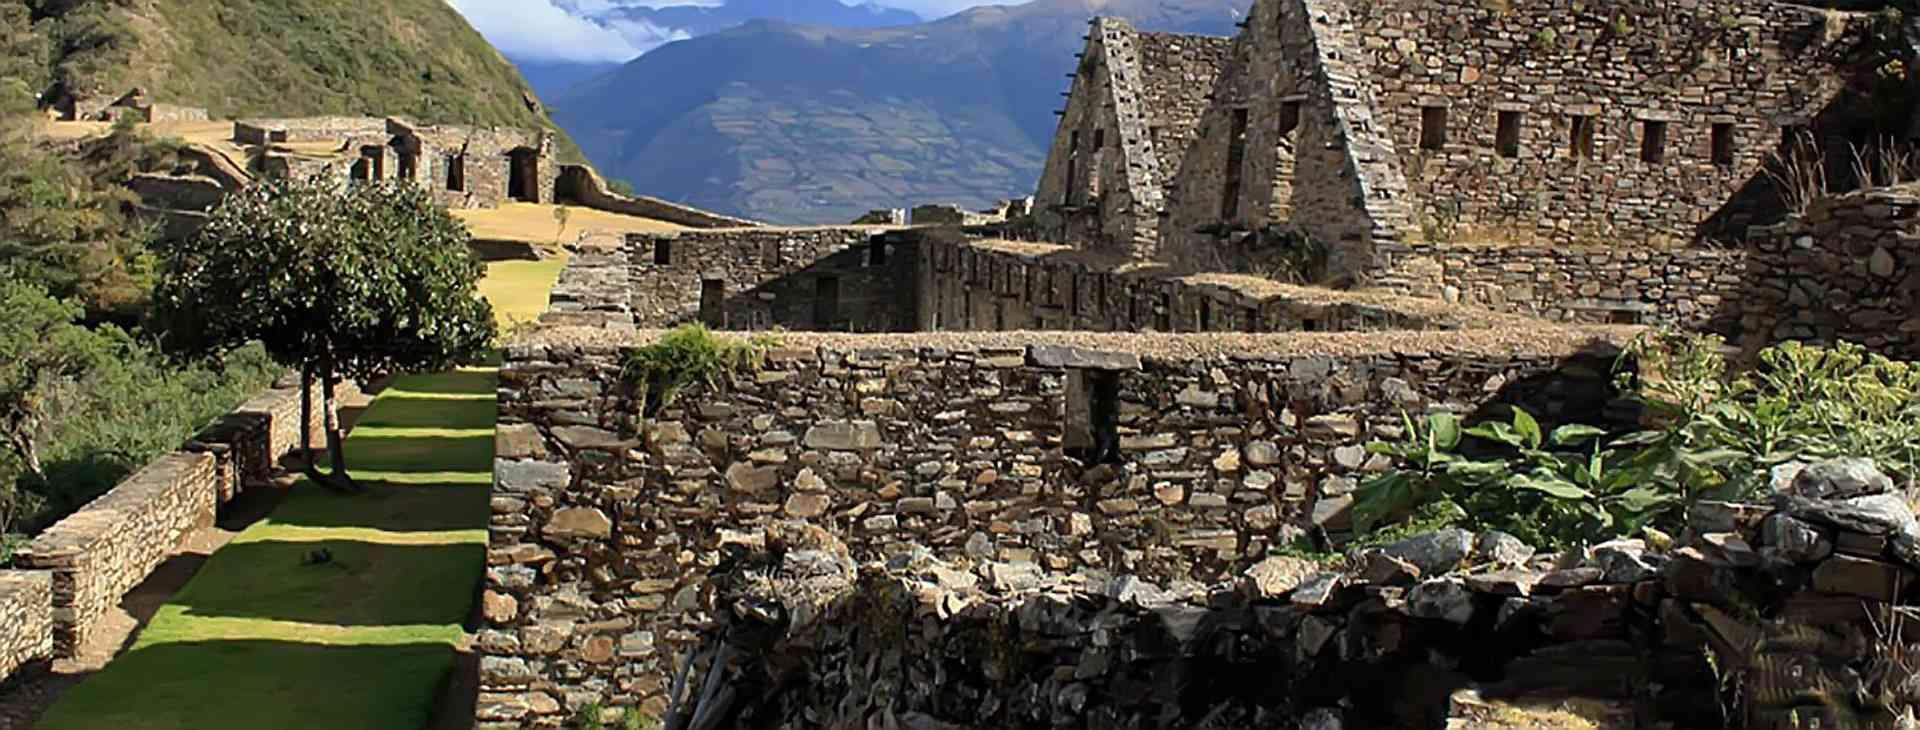 Viaje a Choquequirao Trek 4 dias - TOURS PERU MACHU PICCHU